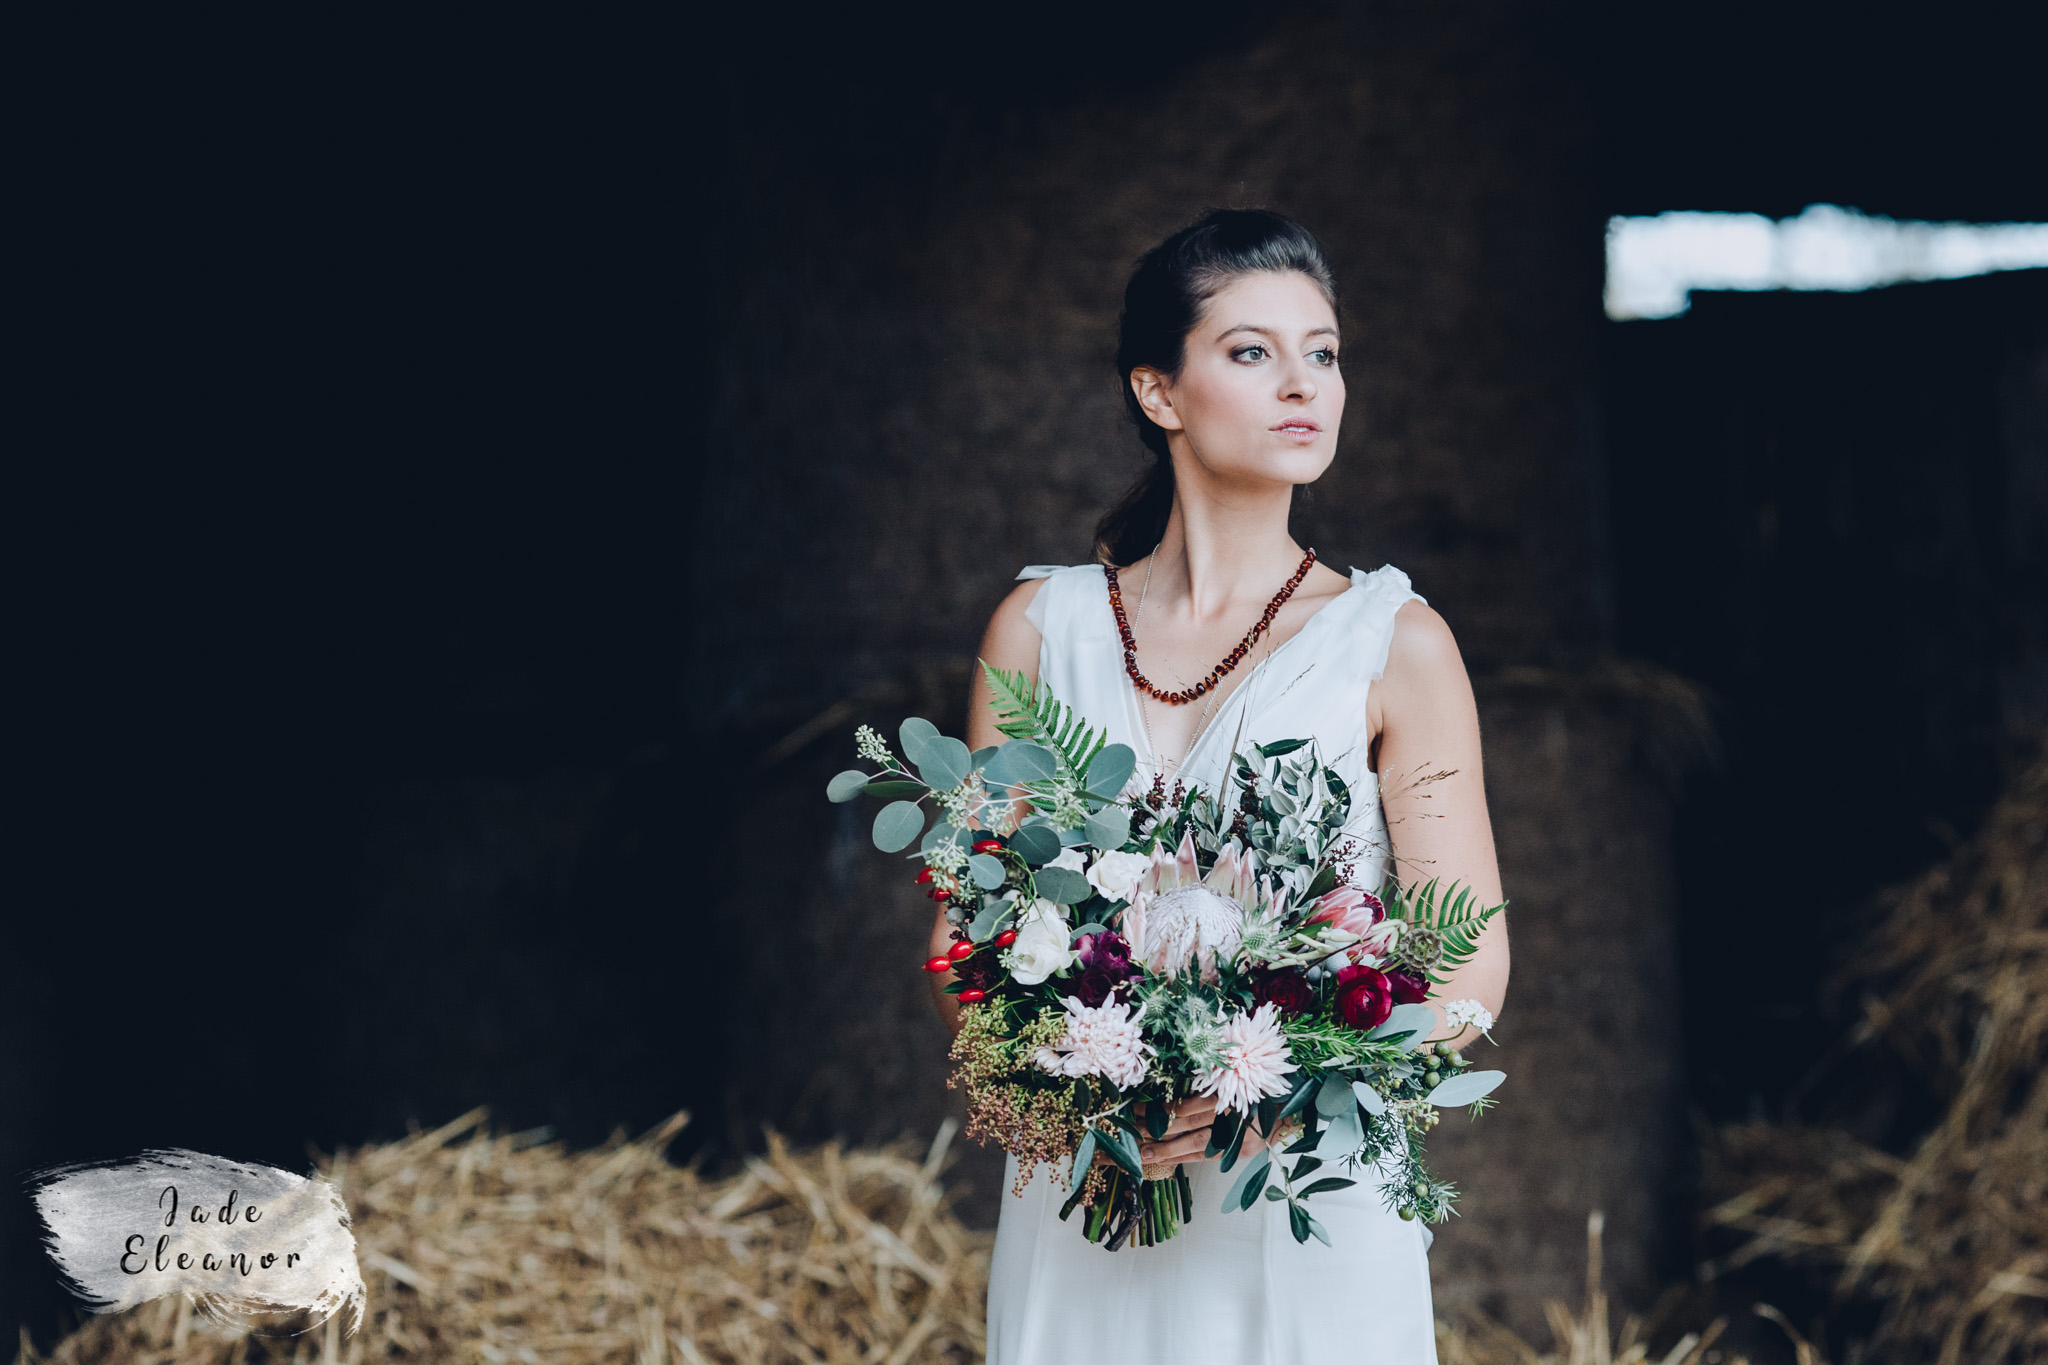 Bysshe Court Barn Wedding Jade Eleanor Photography-22.jpg